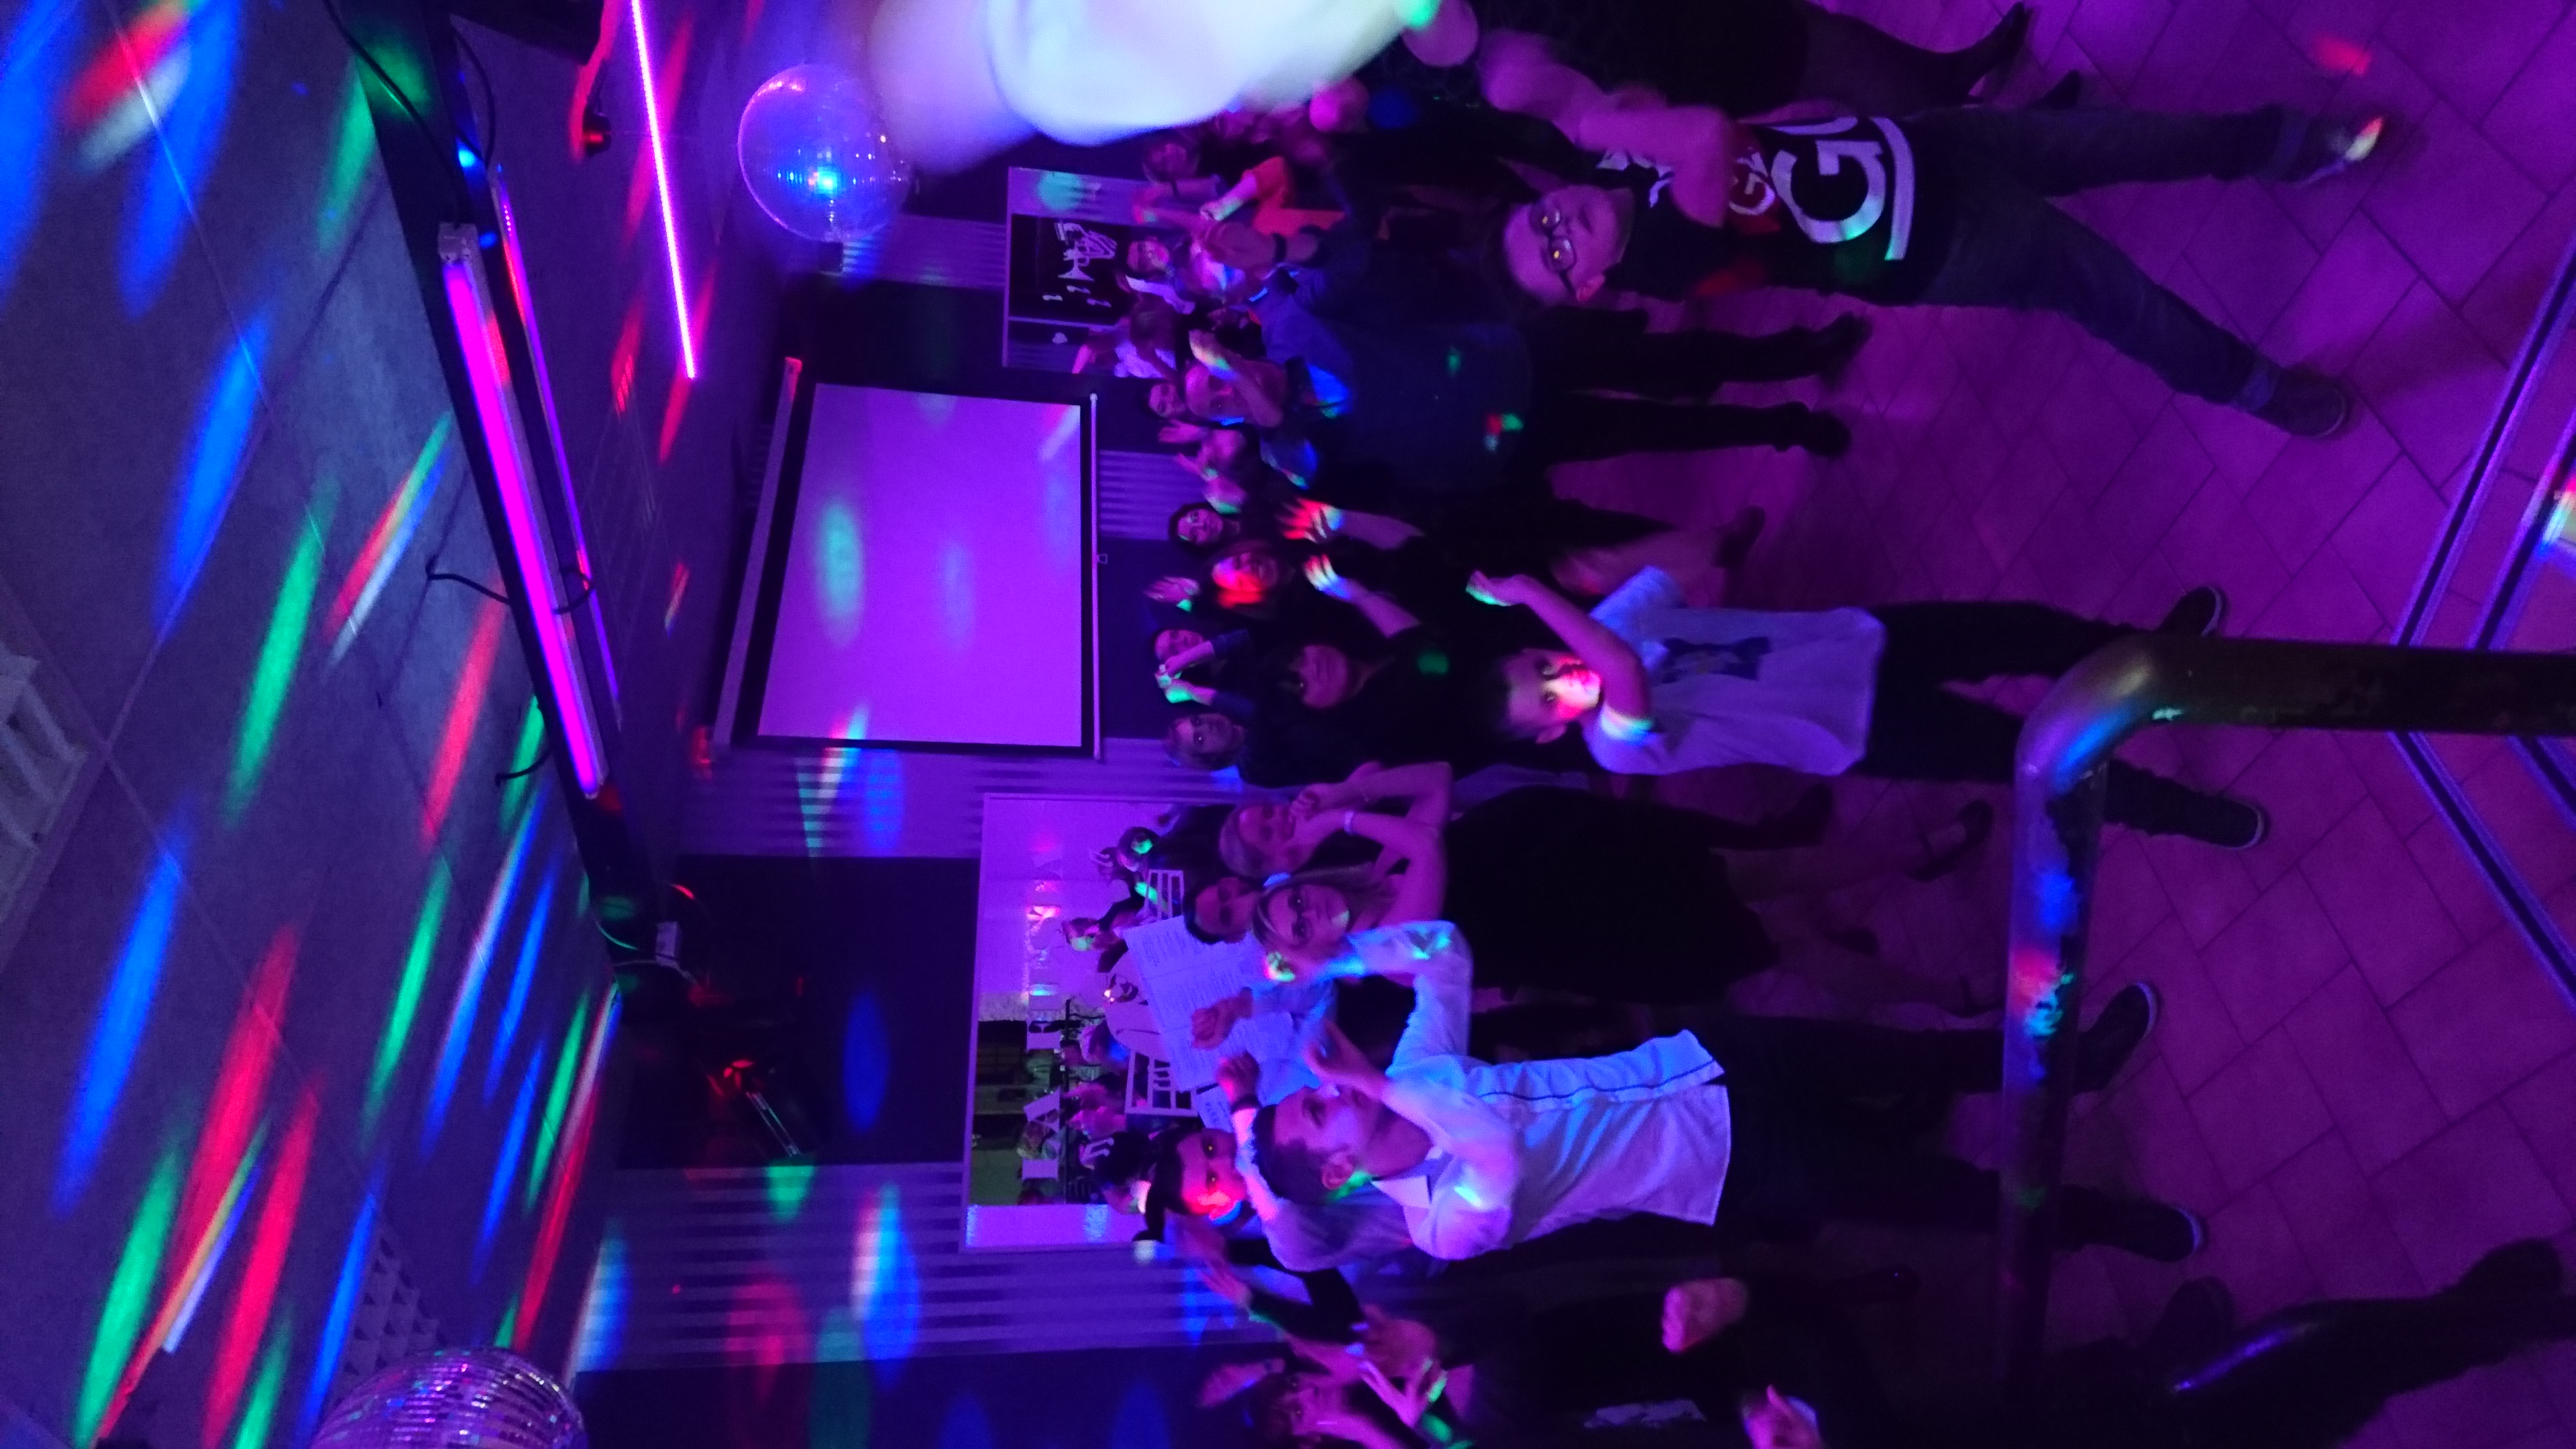 Soirée karaoke dansante